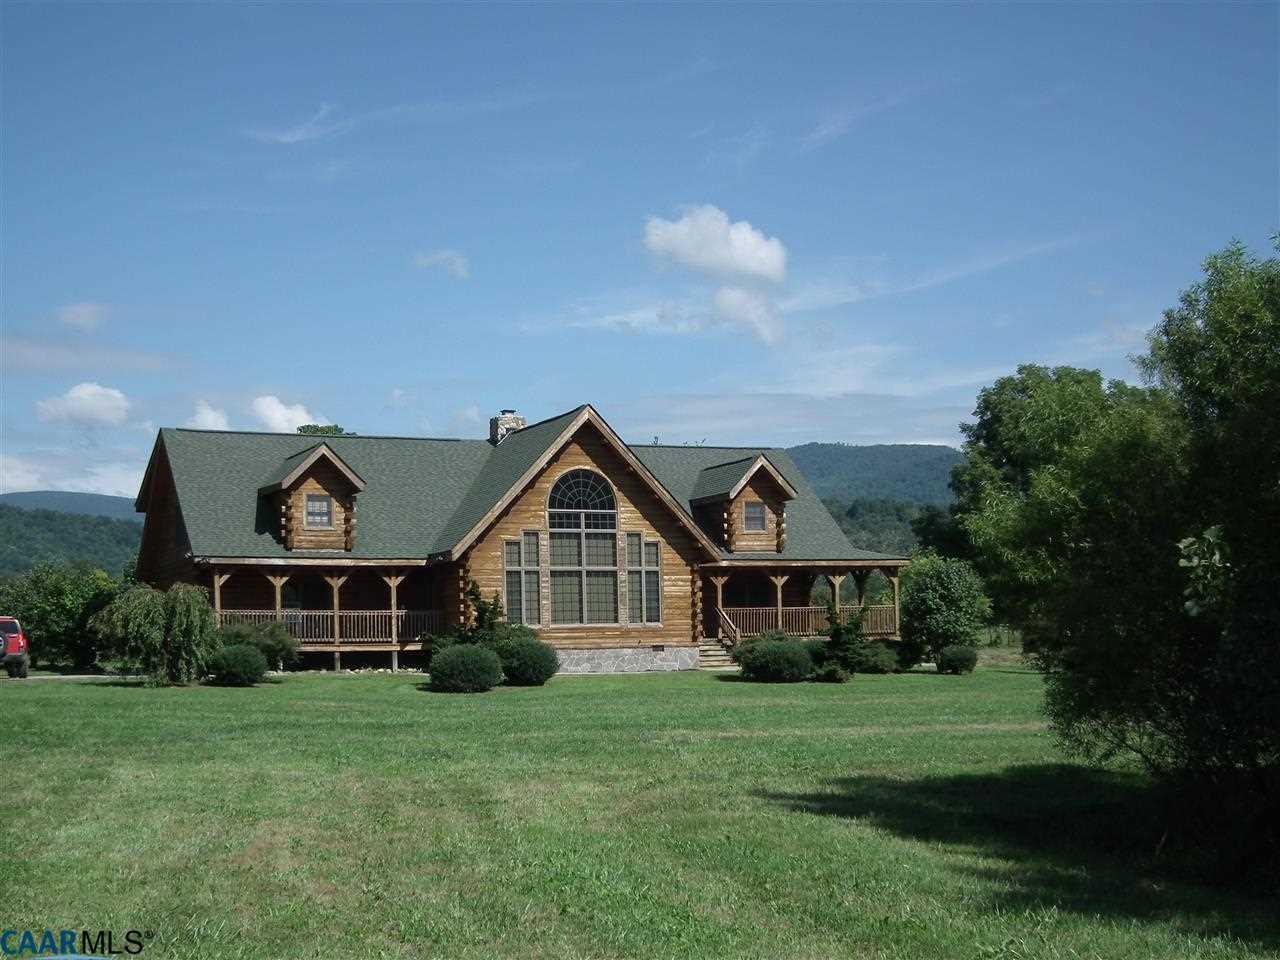 home for sale , MLS #524275, 2952 Old Blue Ridge Tpk